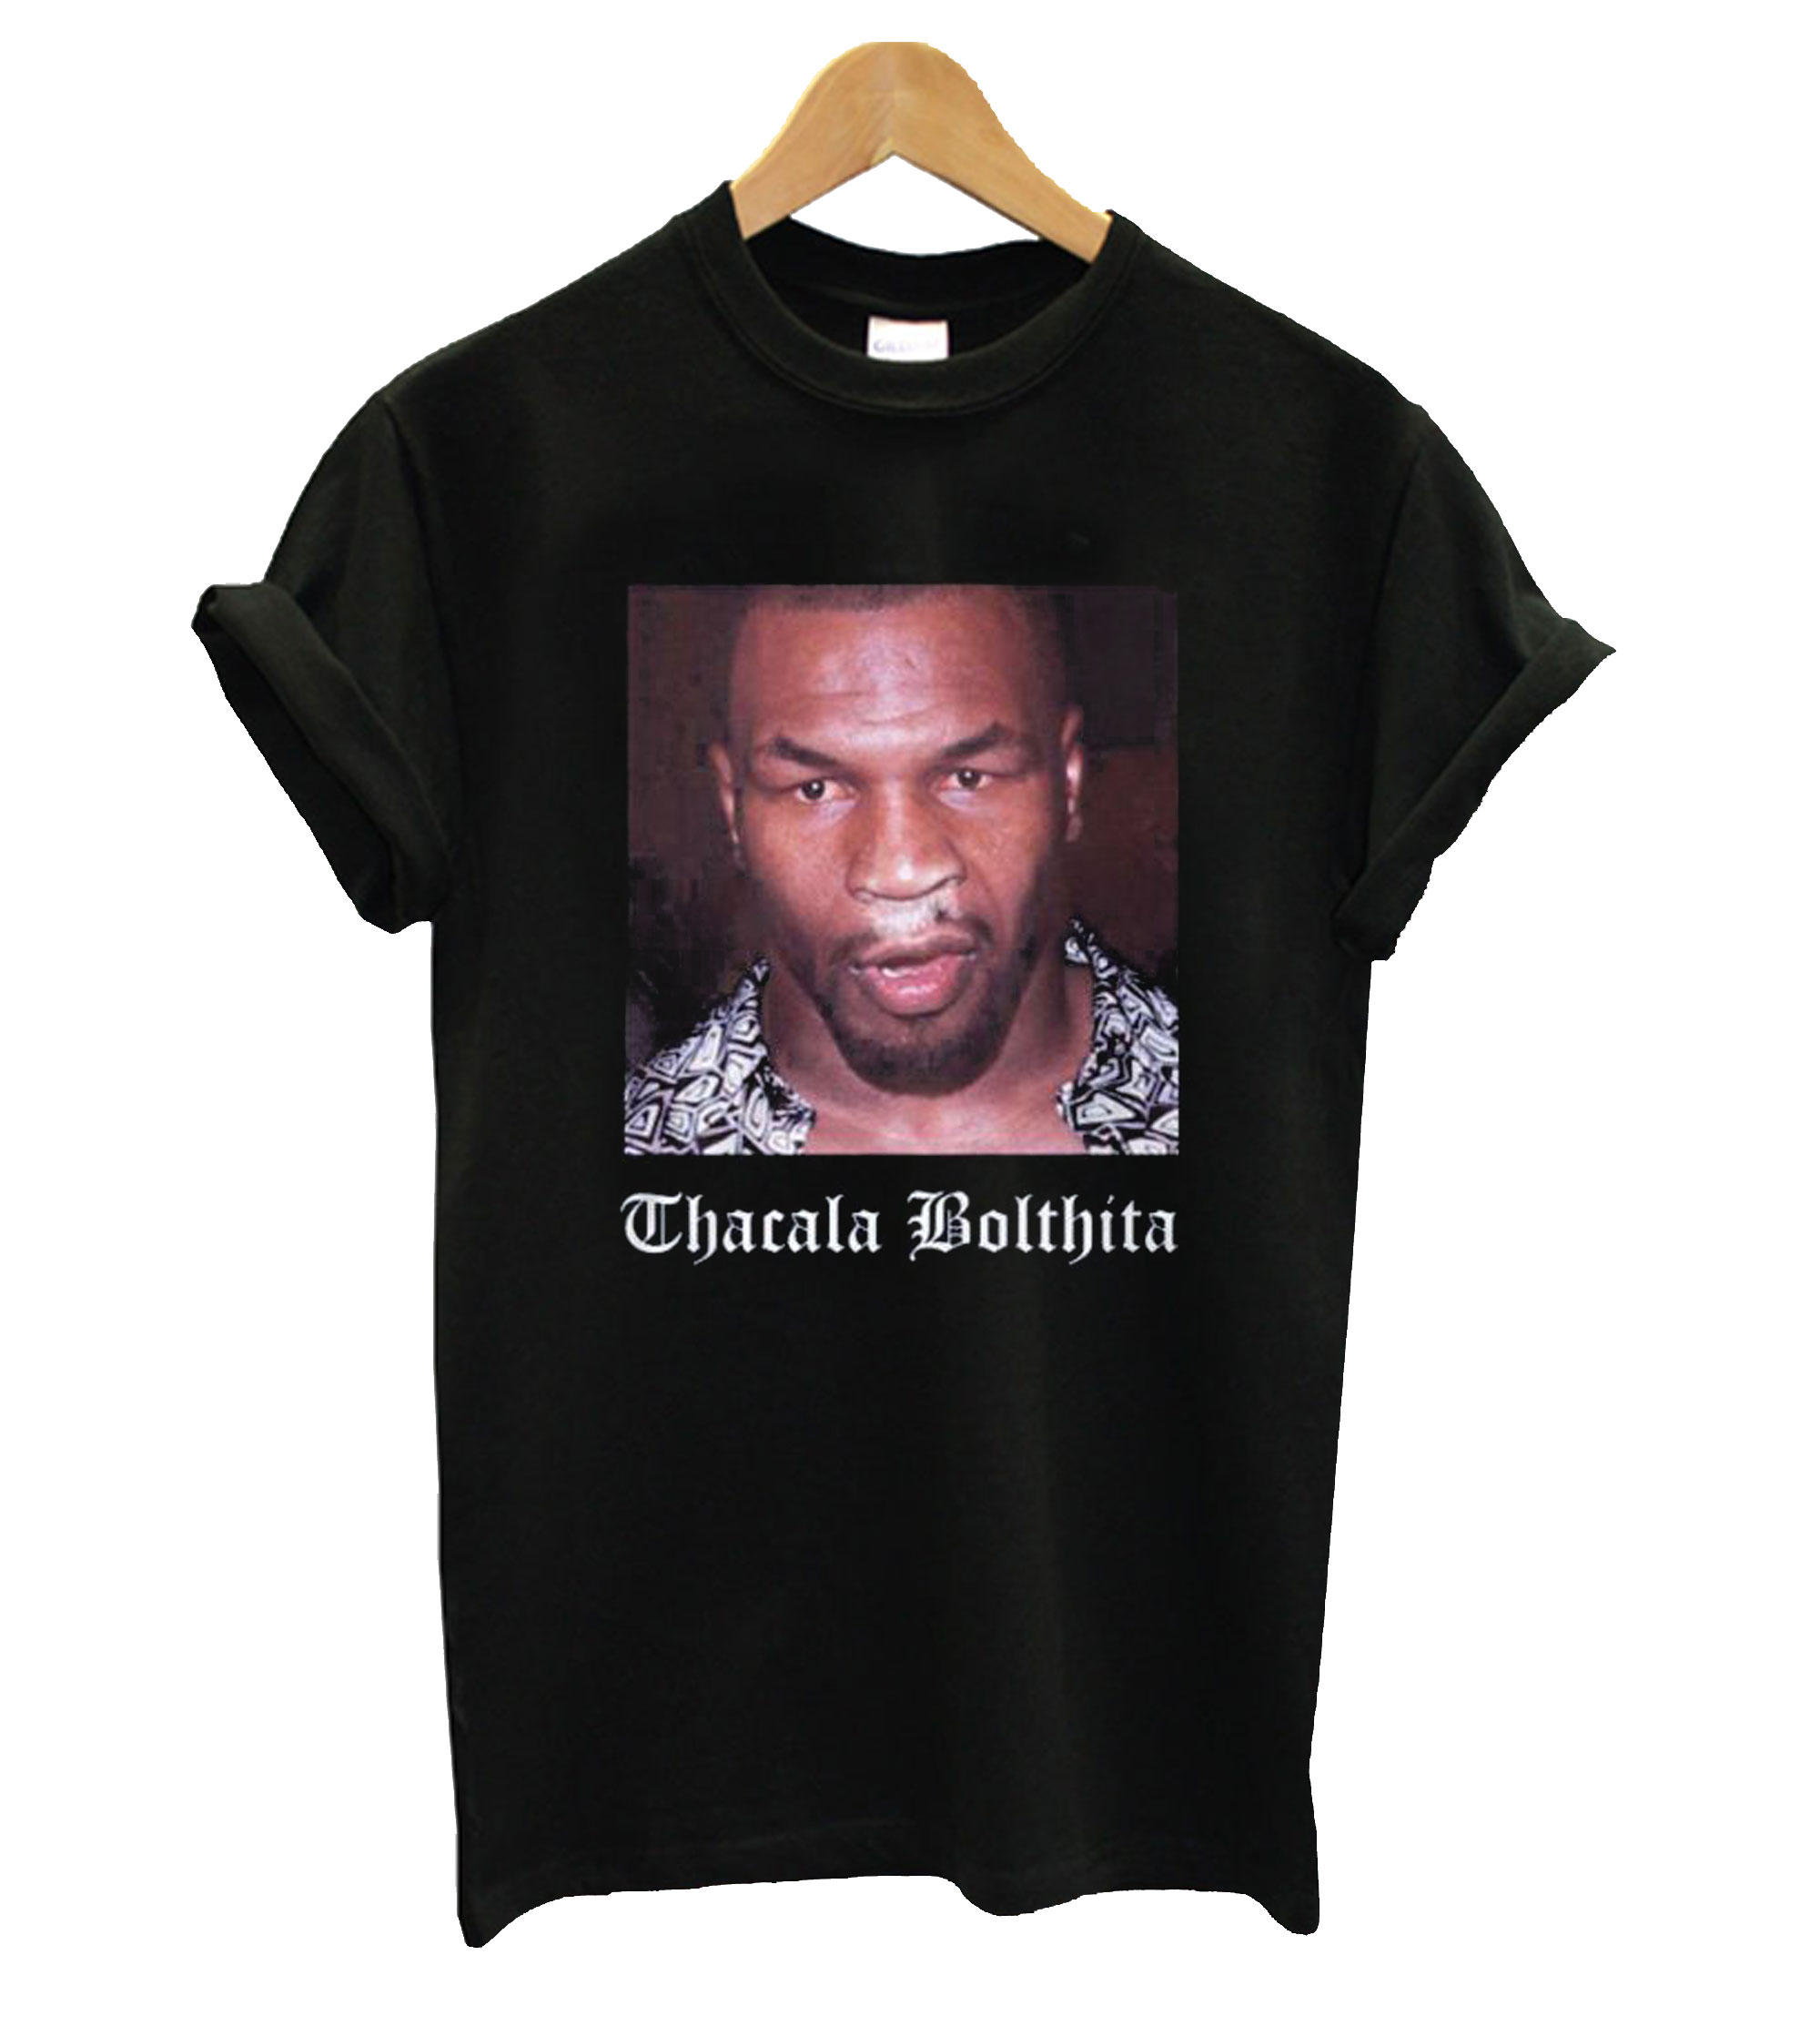 Mike Tyson Thacala Bolthita T-Shirt